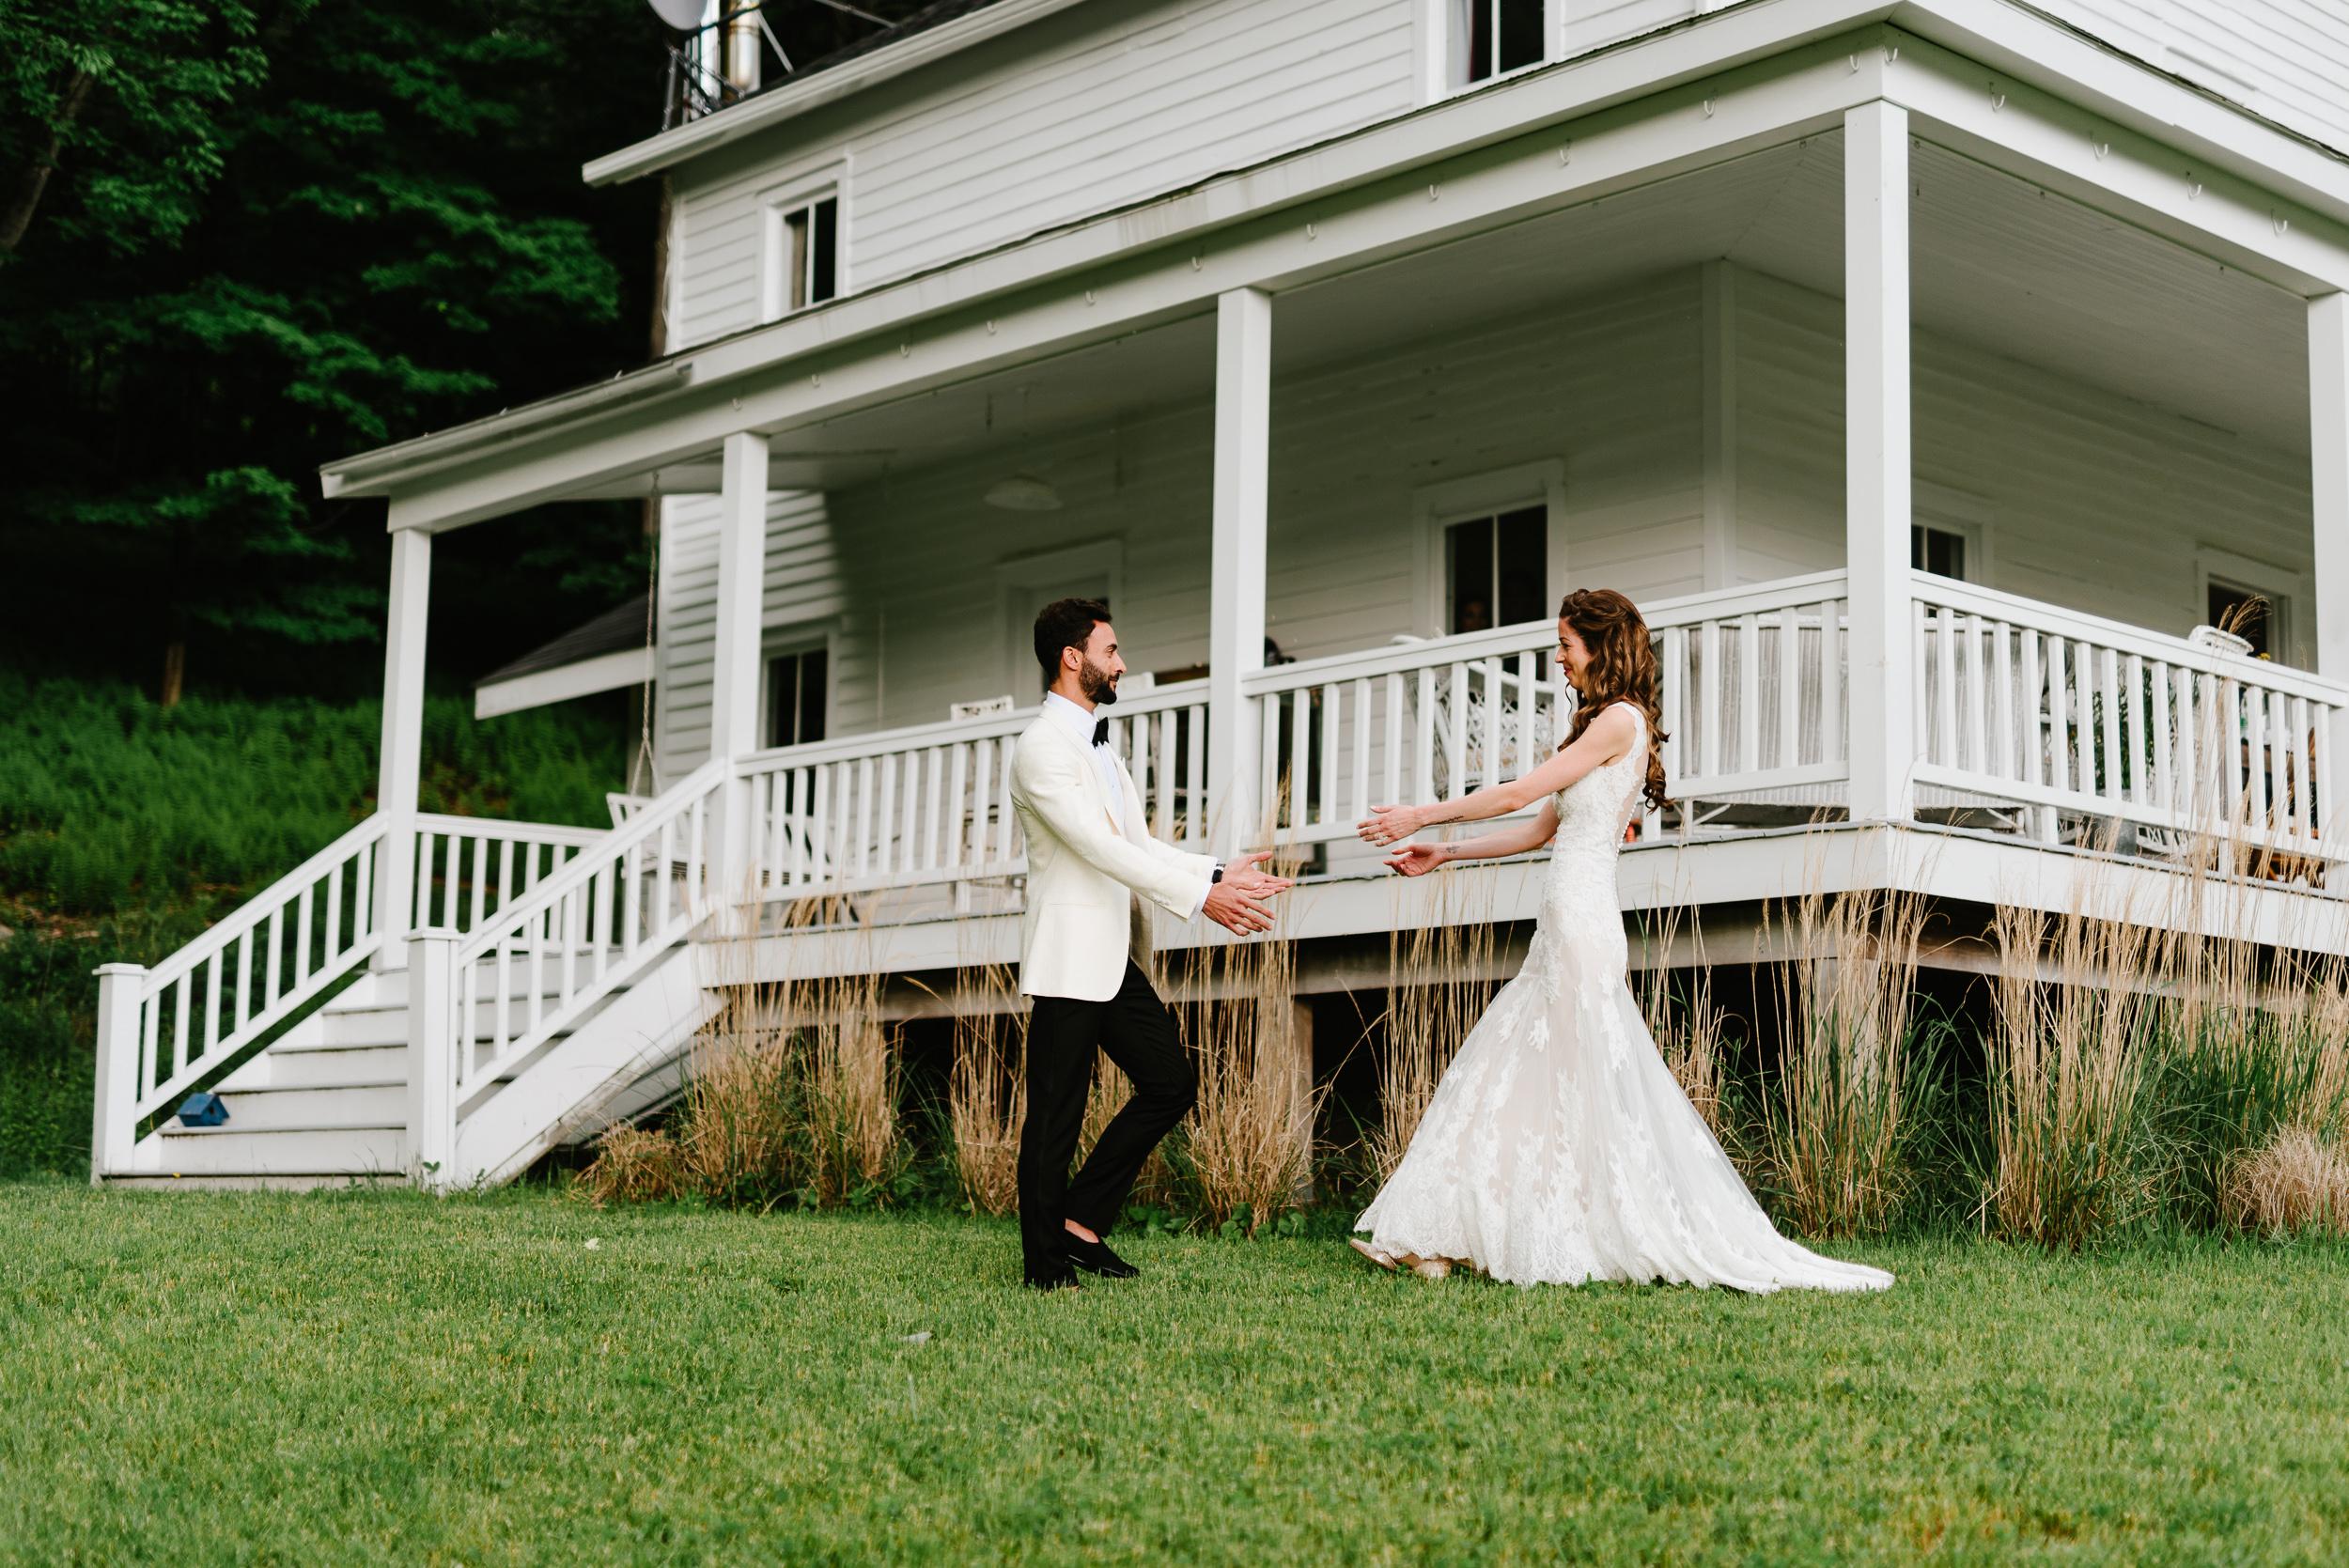 028-Handsome Hollow Wedding Photos Handsome Hollow Wedding Air BNB Wedding Brooklyn Wedding Photographer.jpg